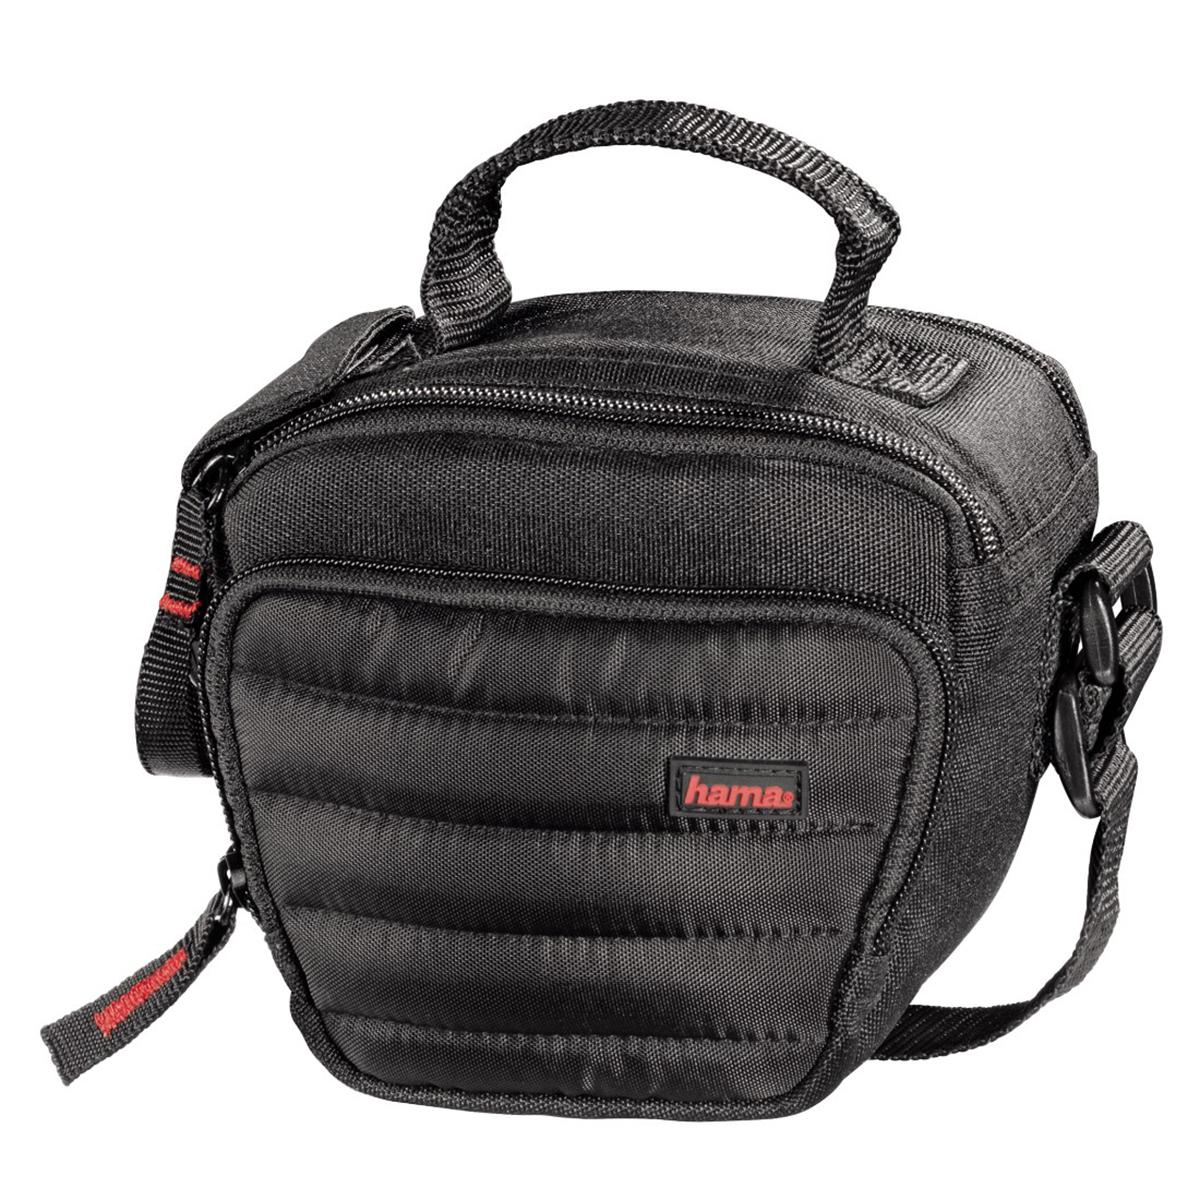 Syscase Camera Bag 90 Colt/ Black